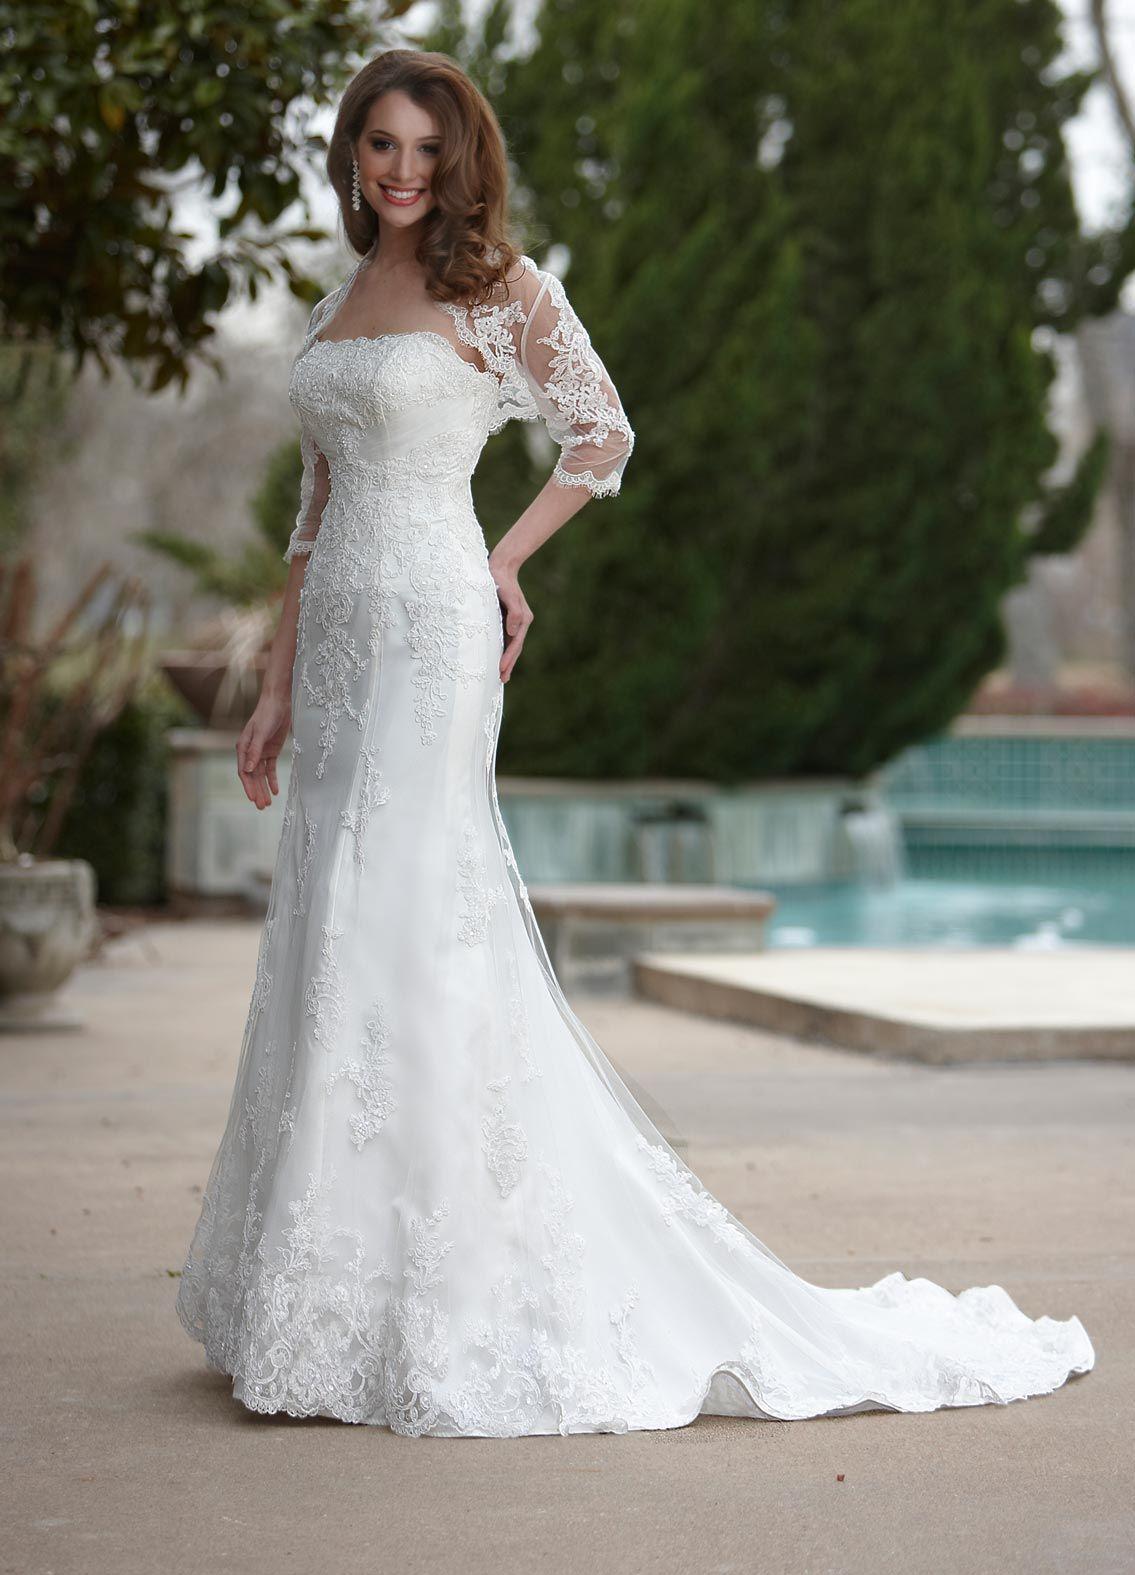 Davinci bridal style lace wedding dress in stock fashion